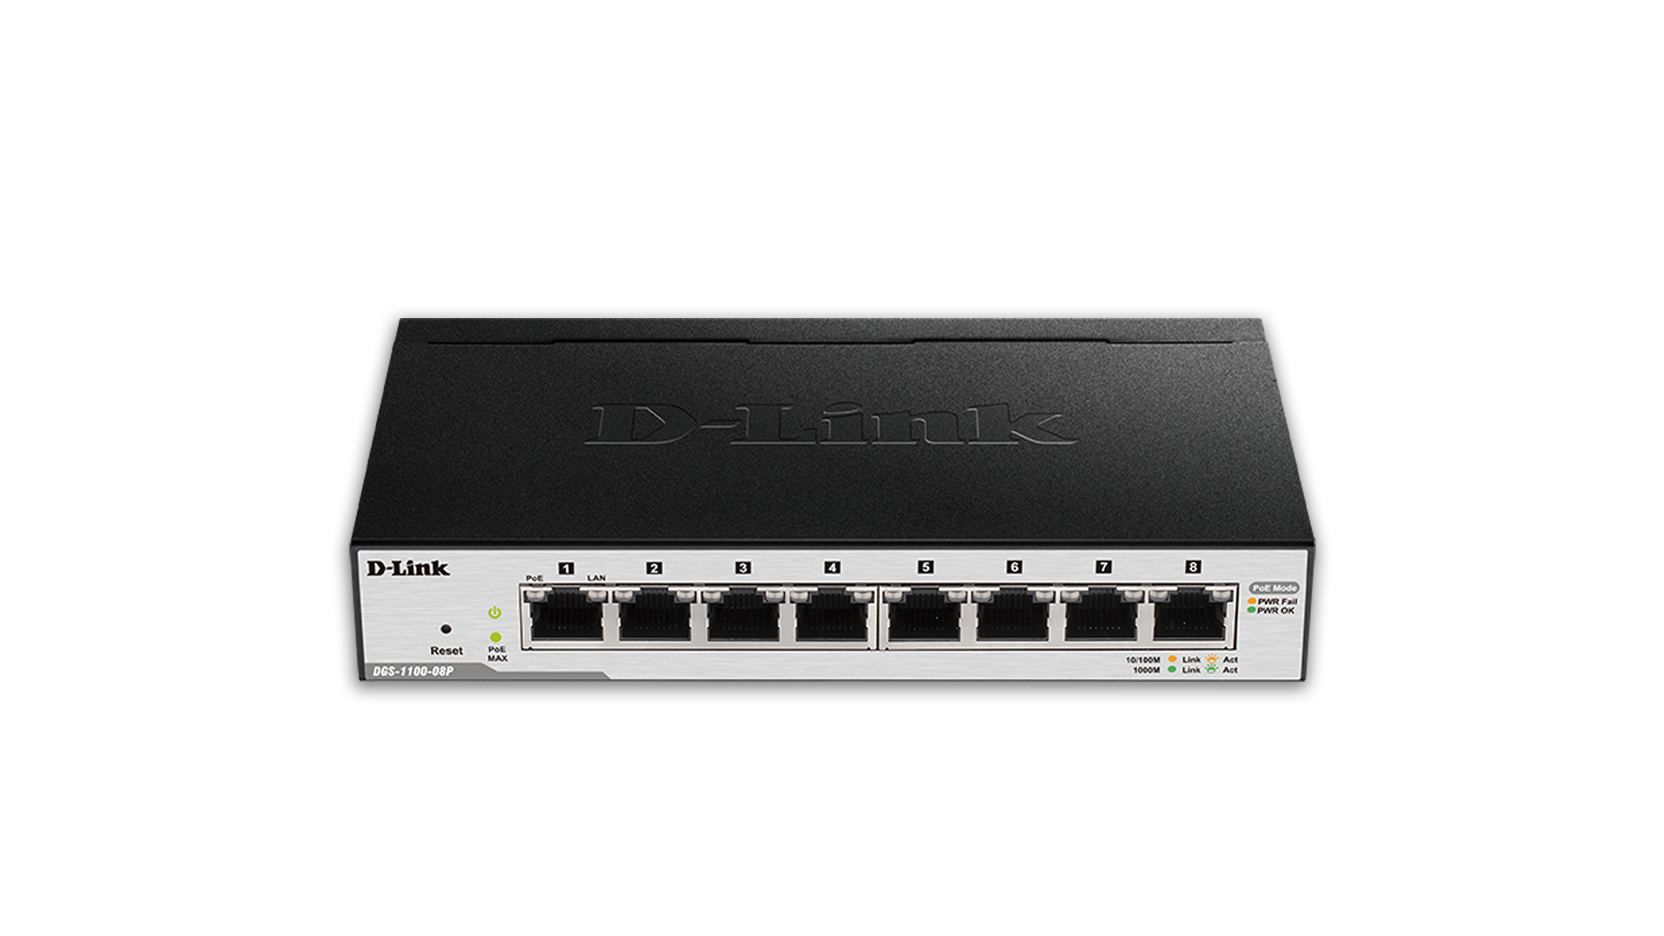 D Link Smart Managed 8 Port Gigabit PoE Switch DGS 1100 08P